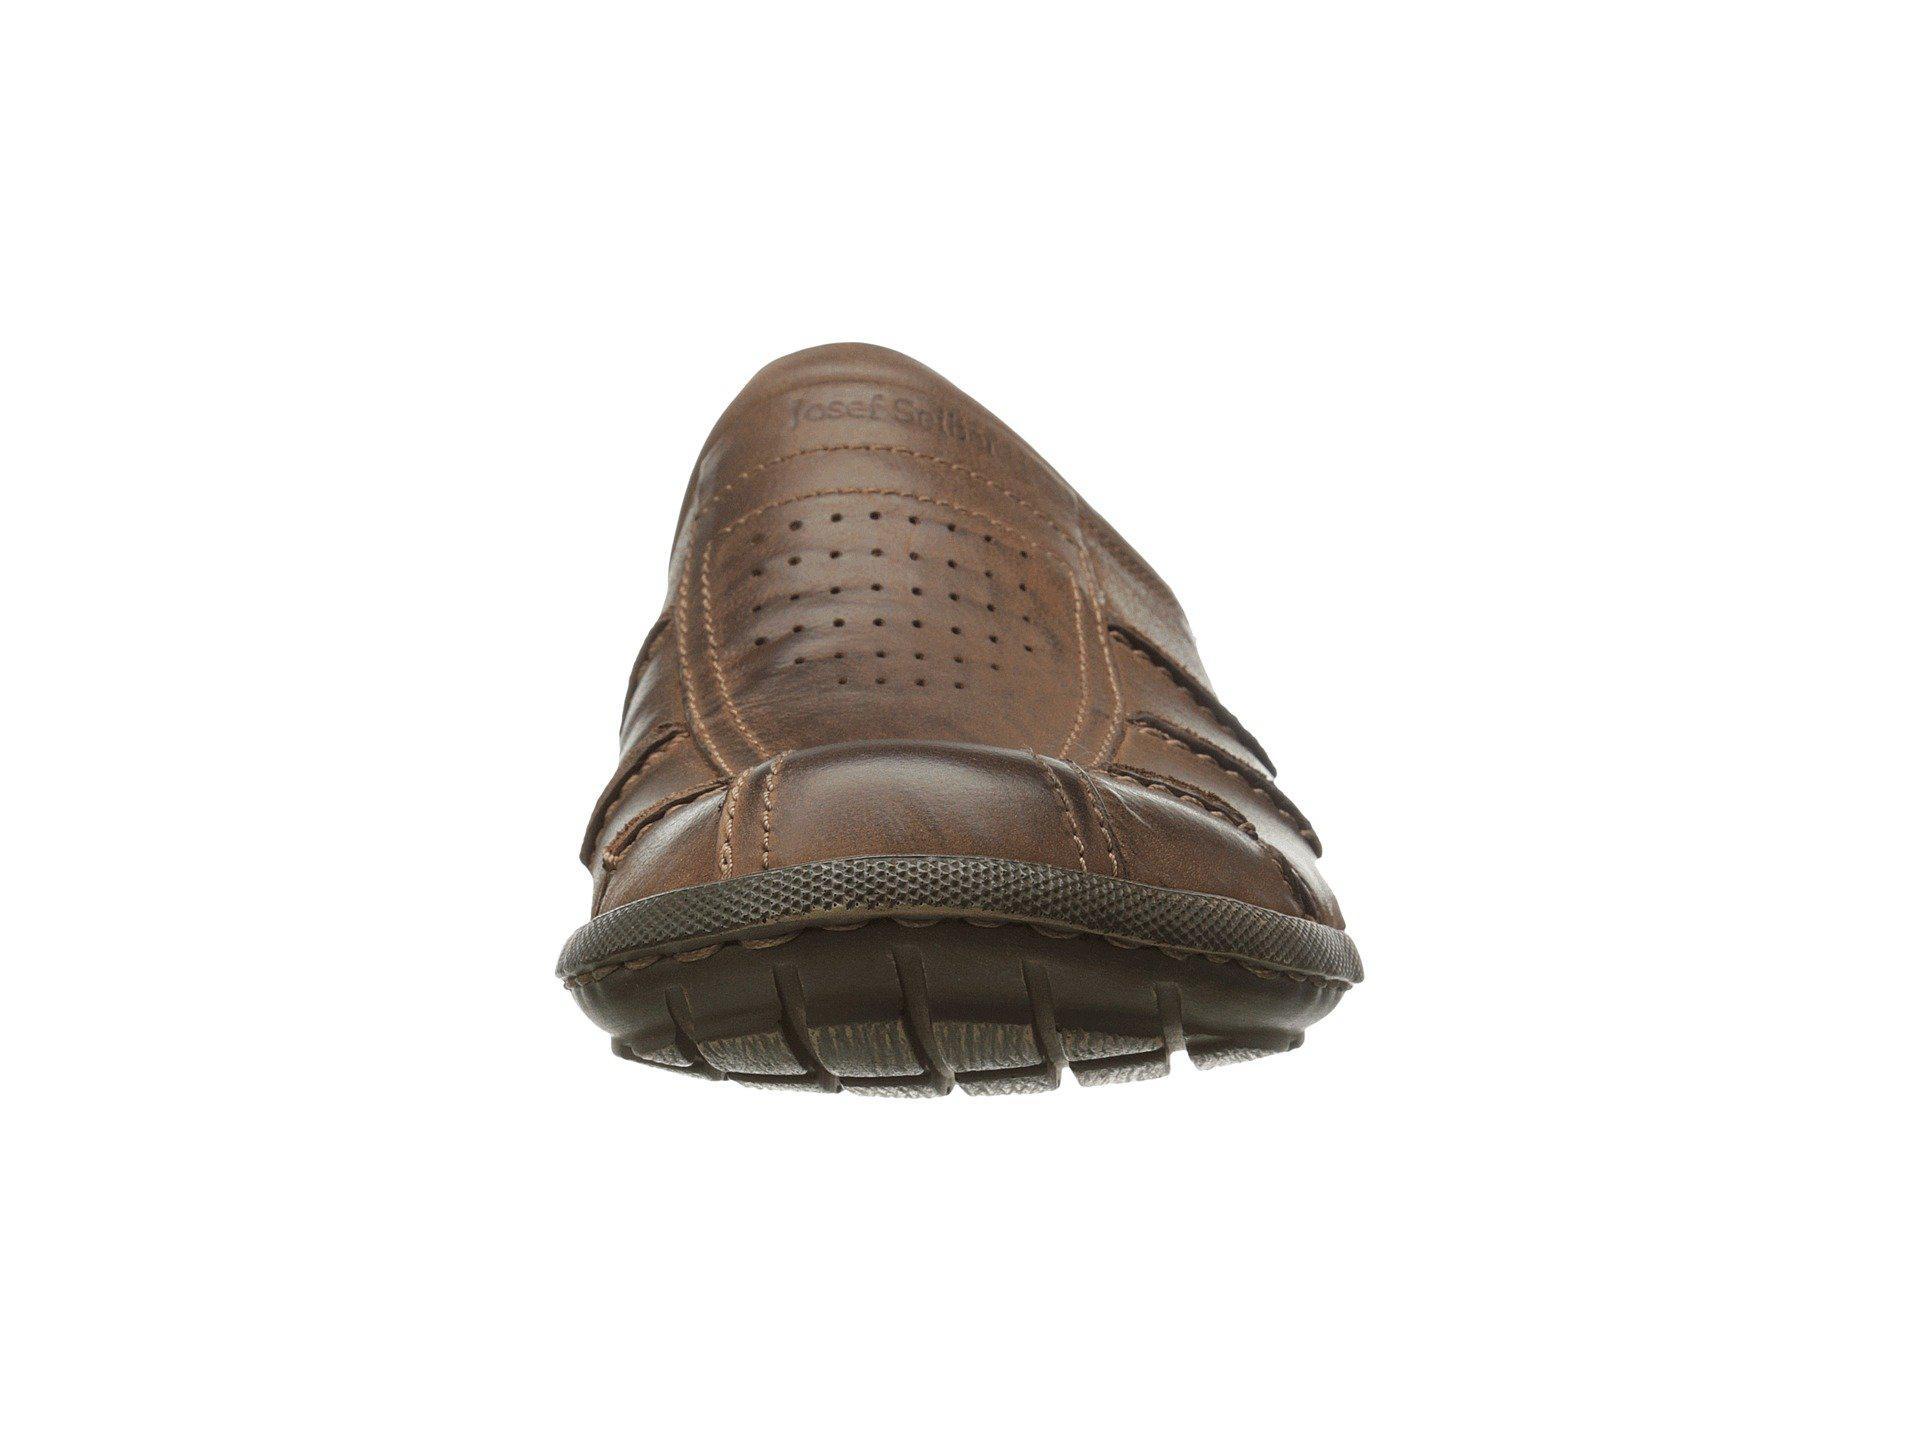 6f72842f198 Lyst - Josef Seibel Logan 22 (nut) Men s Slip On Shoes in Brown for Men